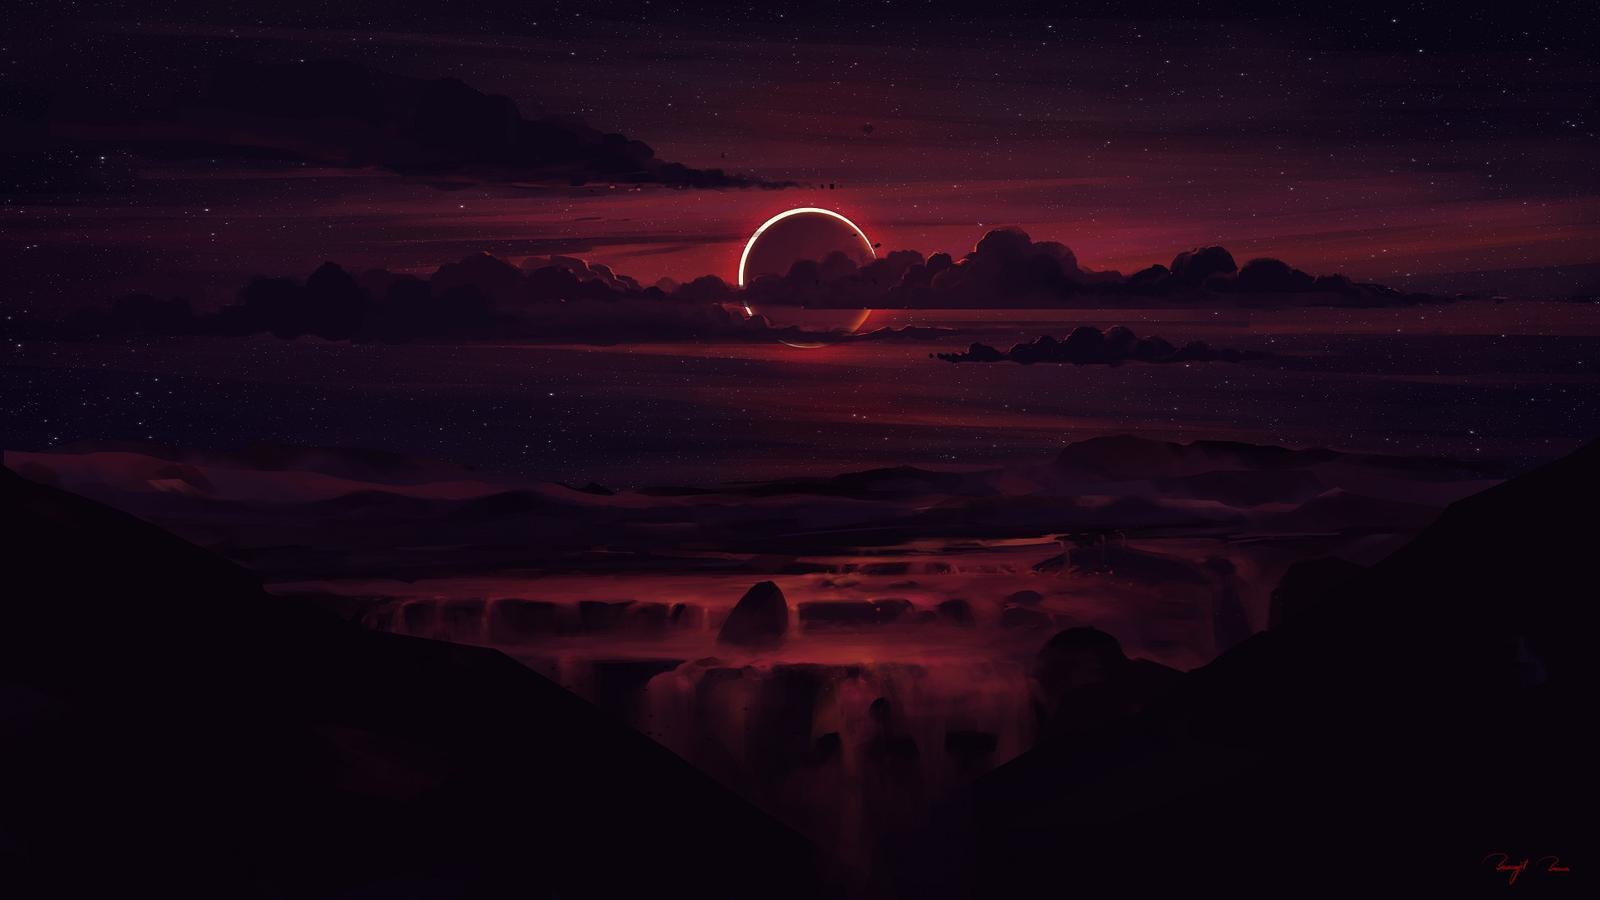 Обои Eclipse, дорога. закат, Alena Aenami. Разное foto 11